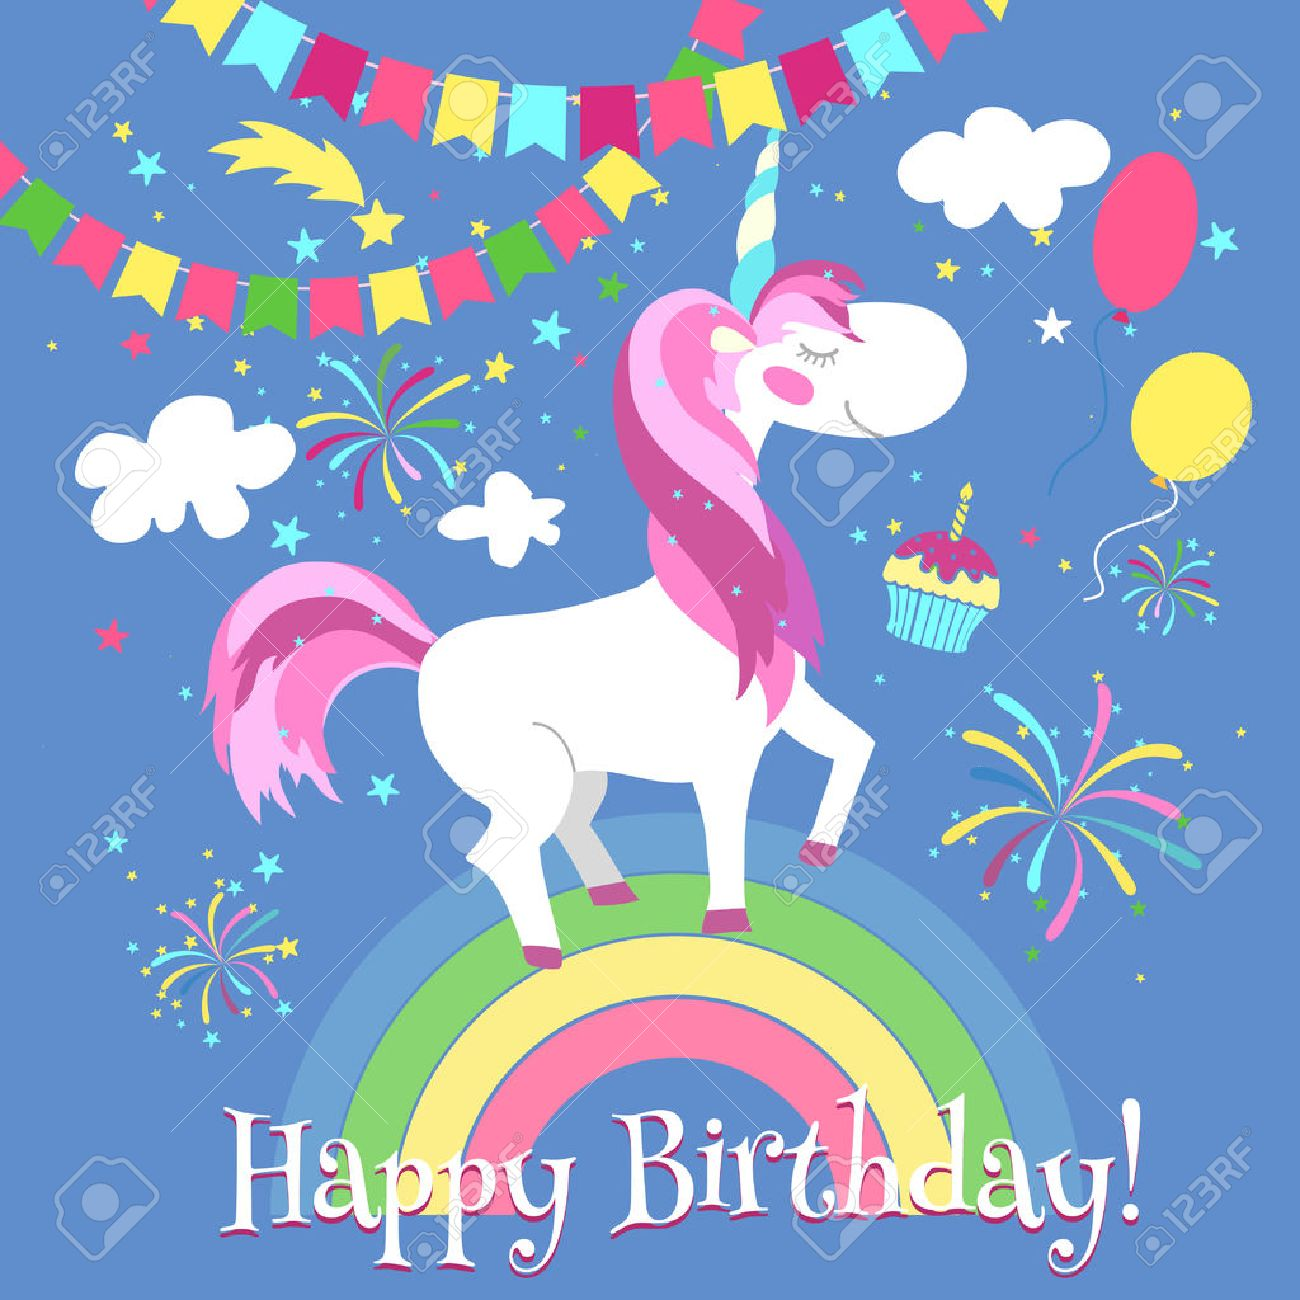 Happy birthday card with cute unicorn. Vector template. Unicorn card birthday, happy unicorn on rainbow, fairytale fantasy unicorn illustration - 55462586